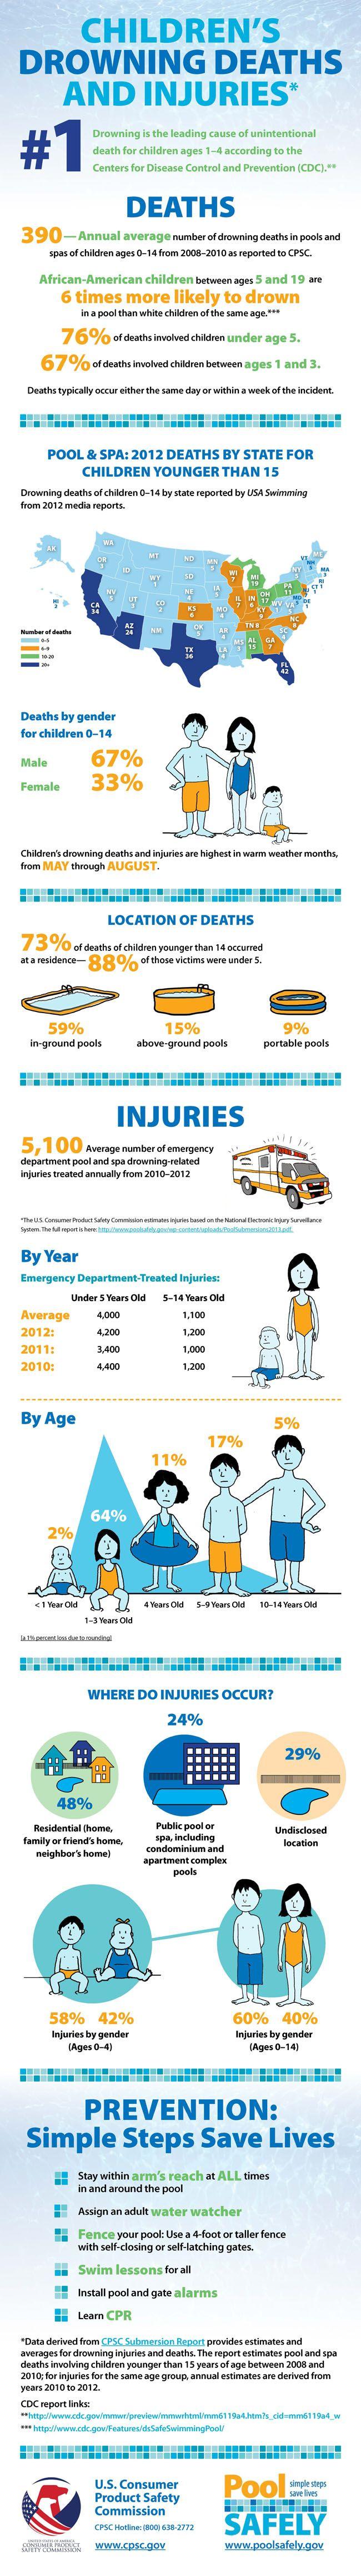 children's drowning deaths & injuries